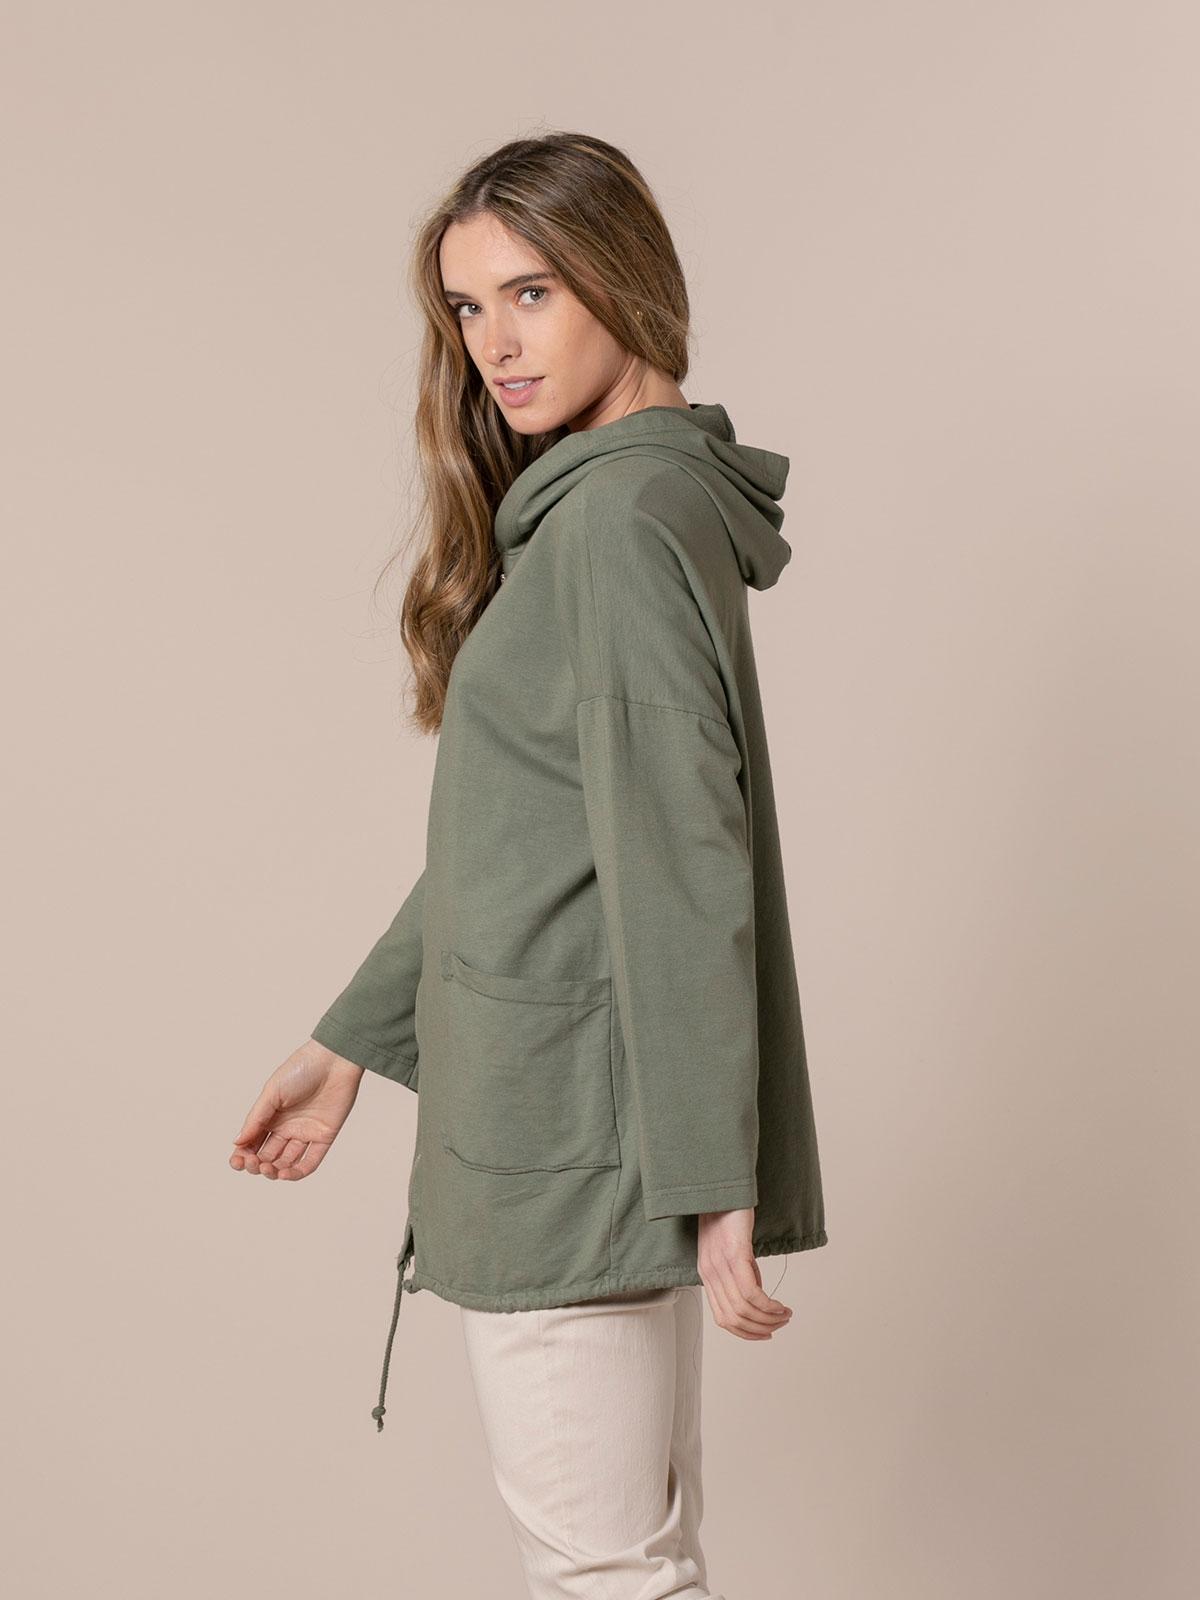 Woman Zip-up sweatshirt with pockets Khaki